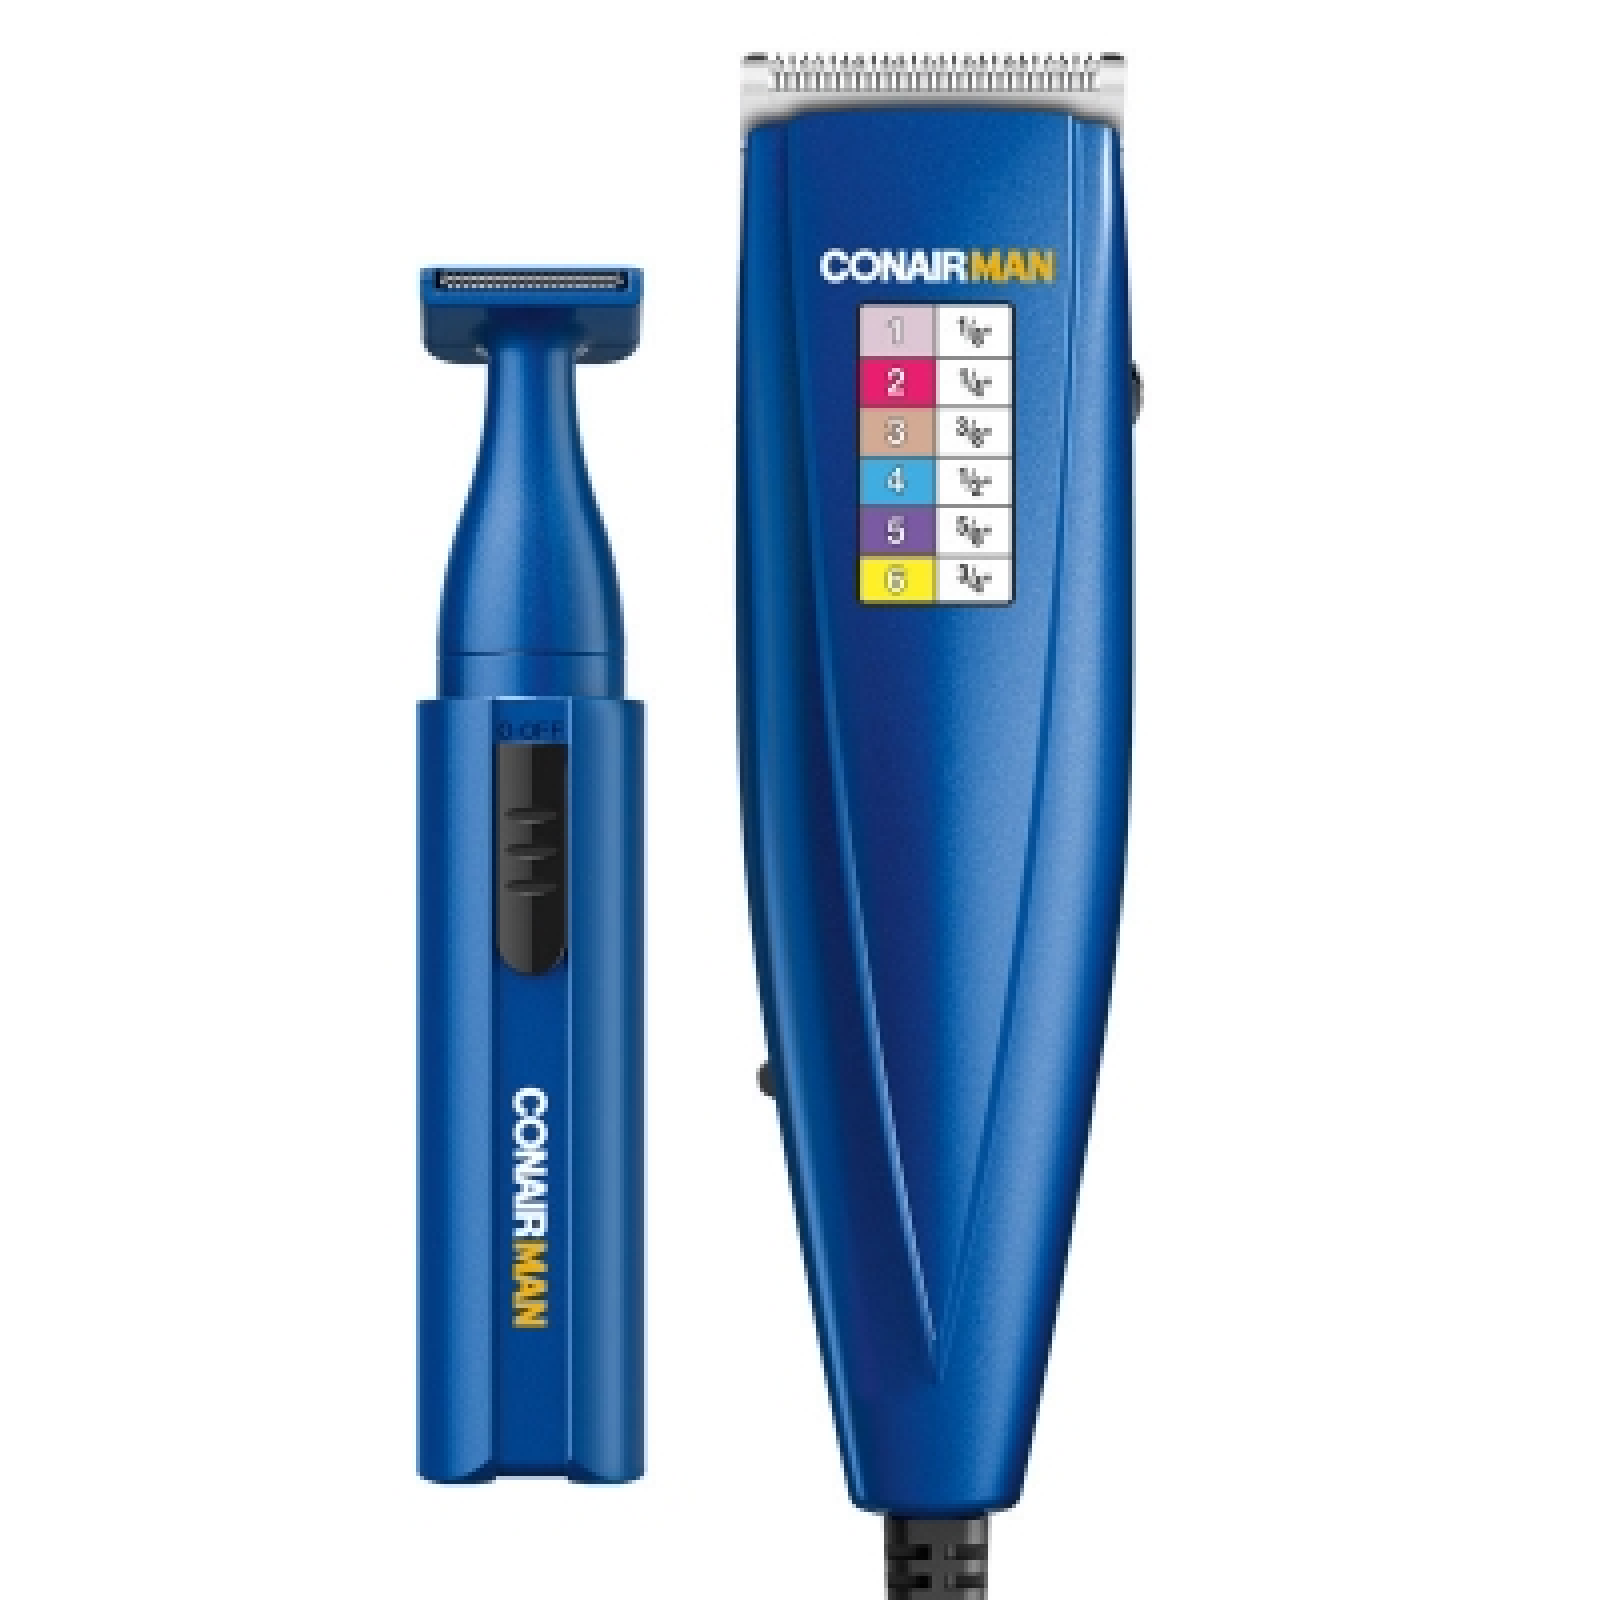 Conair Kit Recortadora HC315N